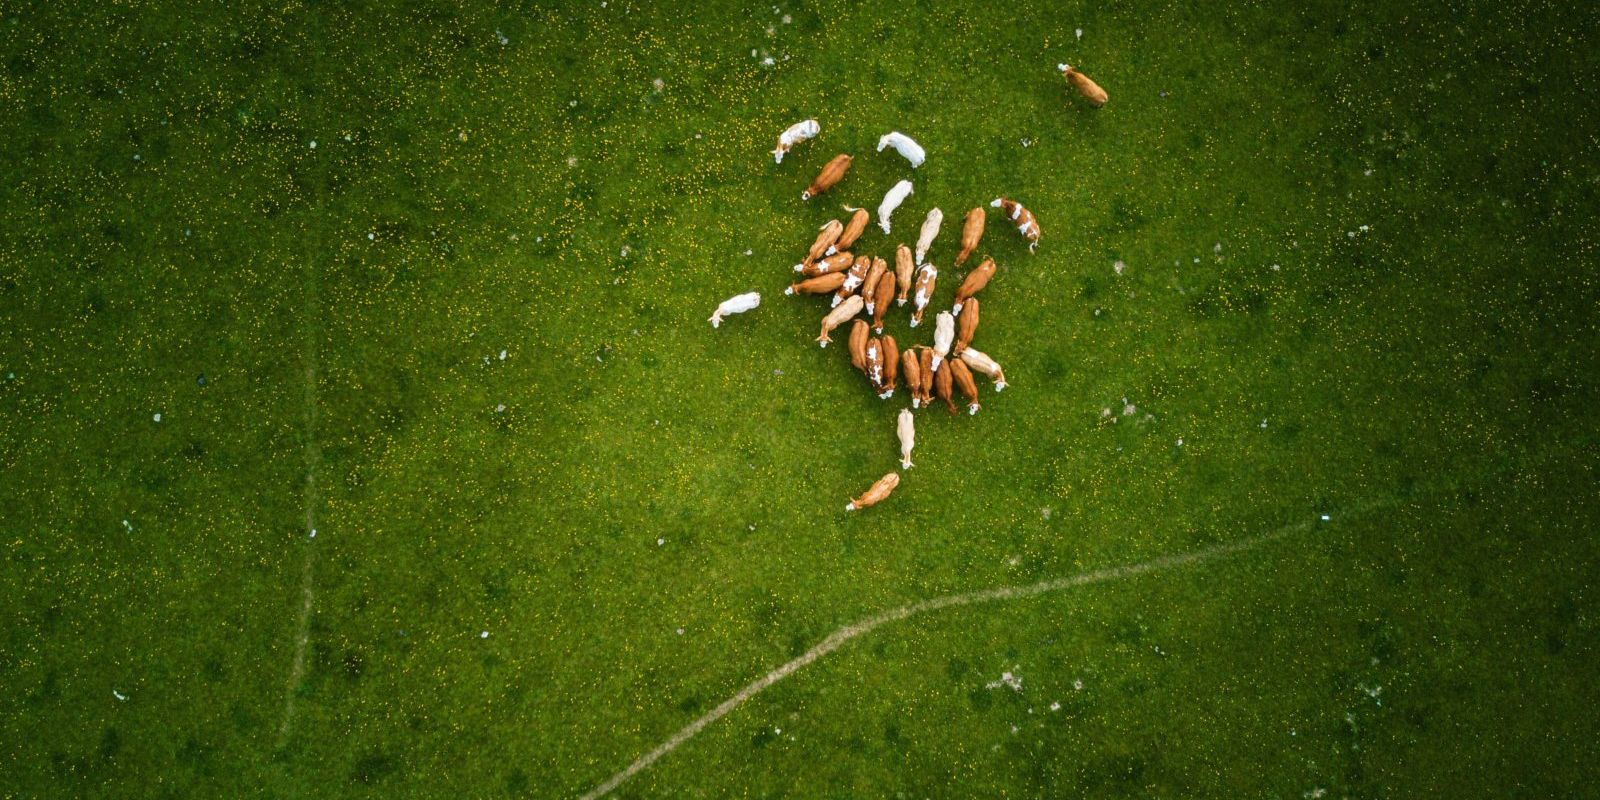 animal-nutrition-aerial-shot